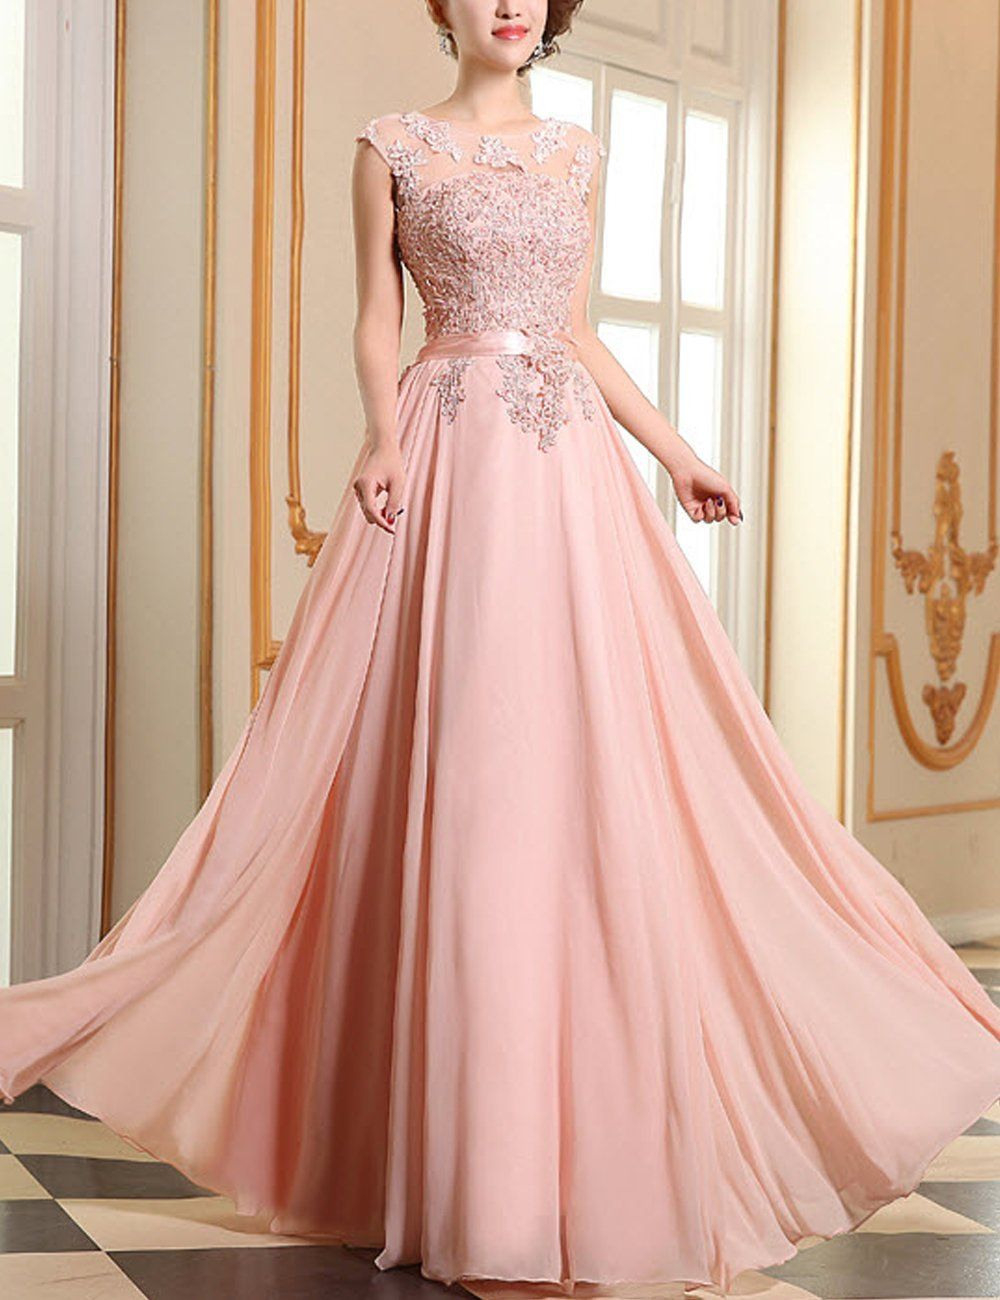 Großartig Abend Kleid Bei Amazon StylishAbend Luxus Abend Kleid Bei Amazon Stylish